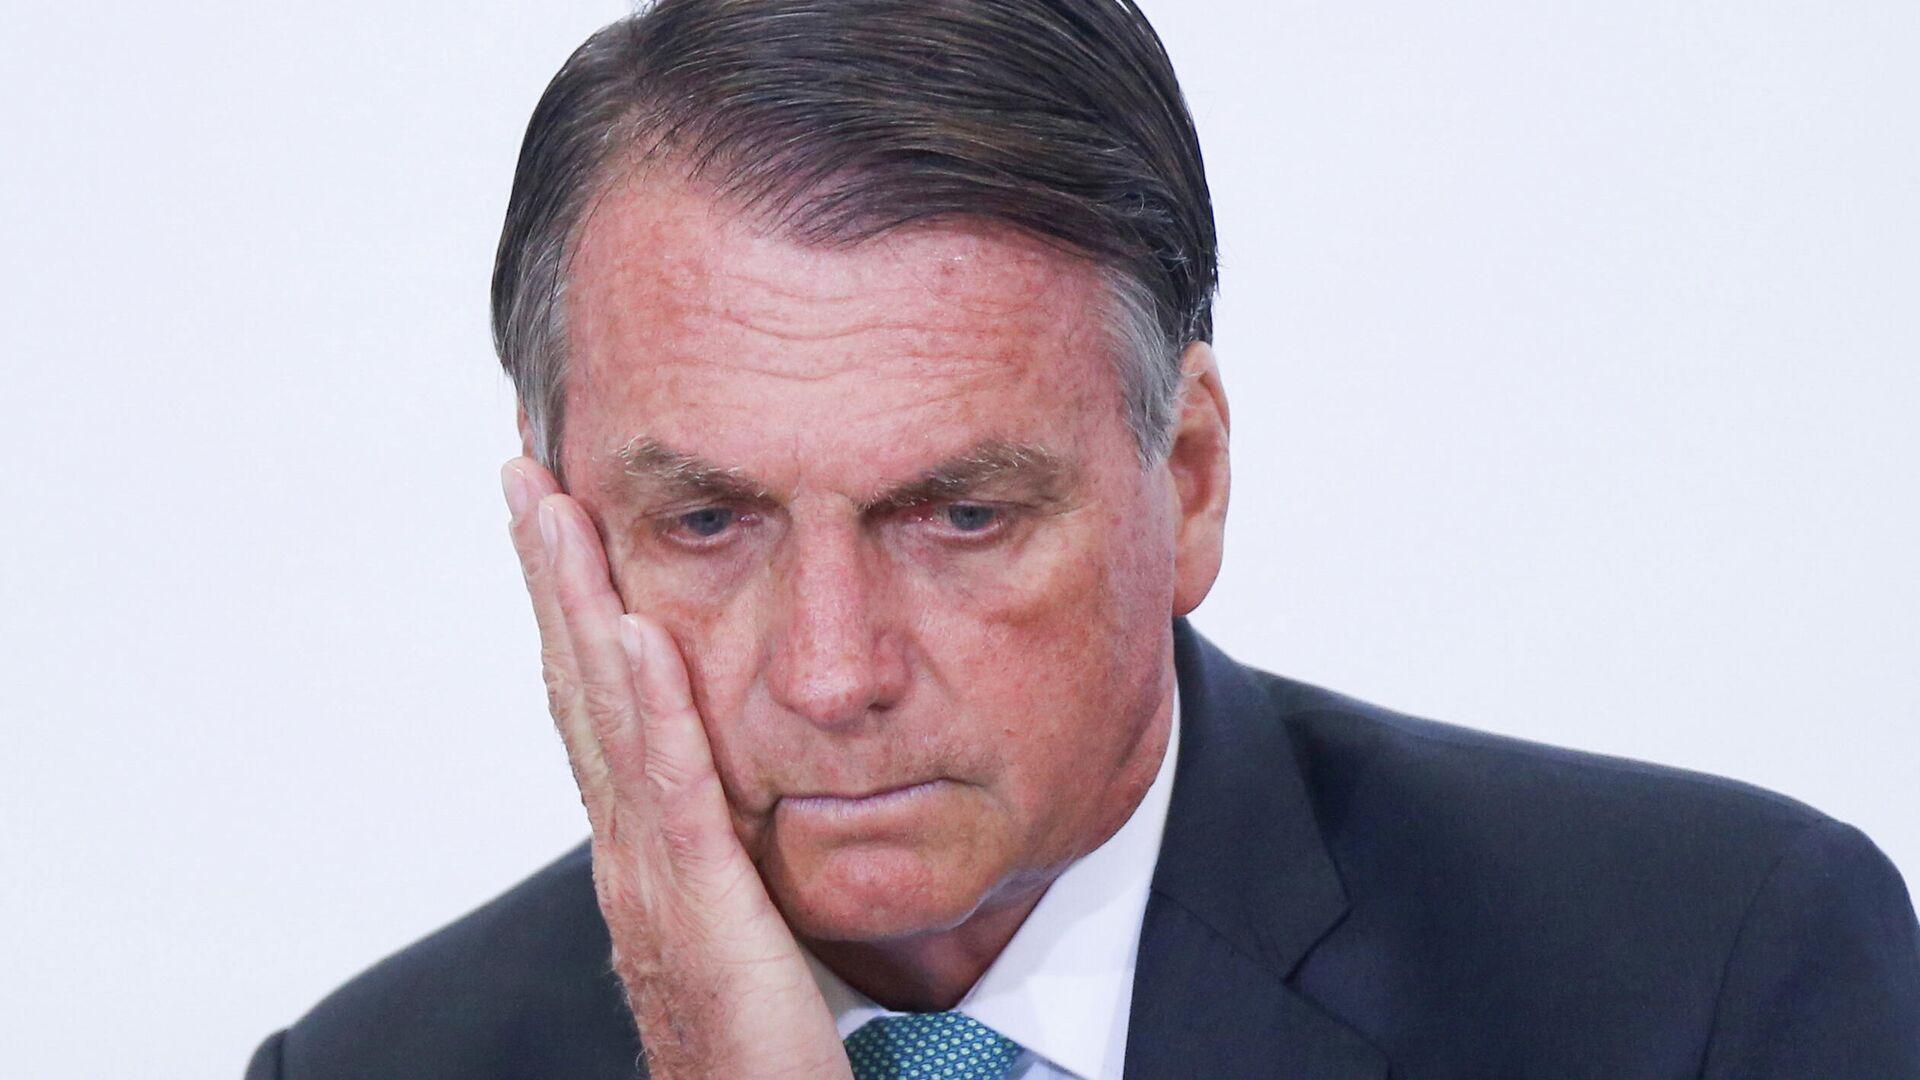 Jair Bolsonaro, presidente de Brasil - Sputnik Mundo, 1920, 17.09.2021